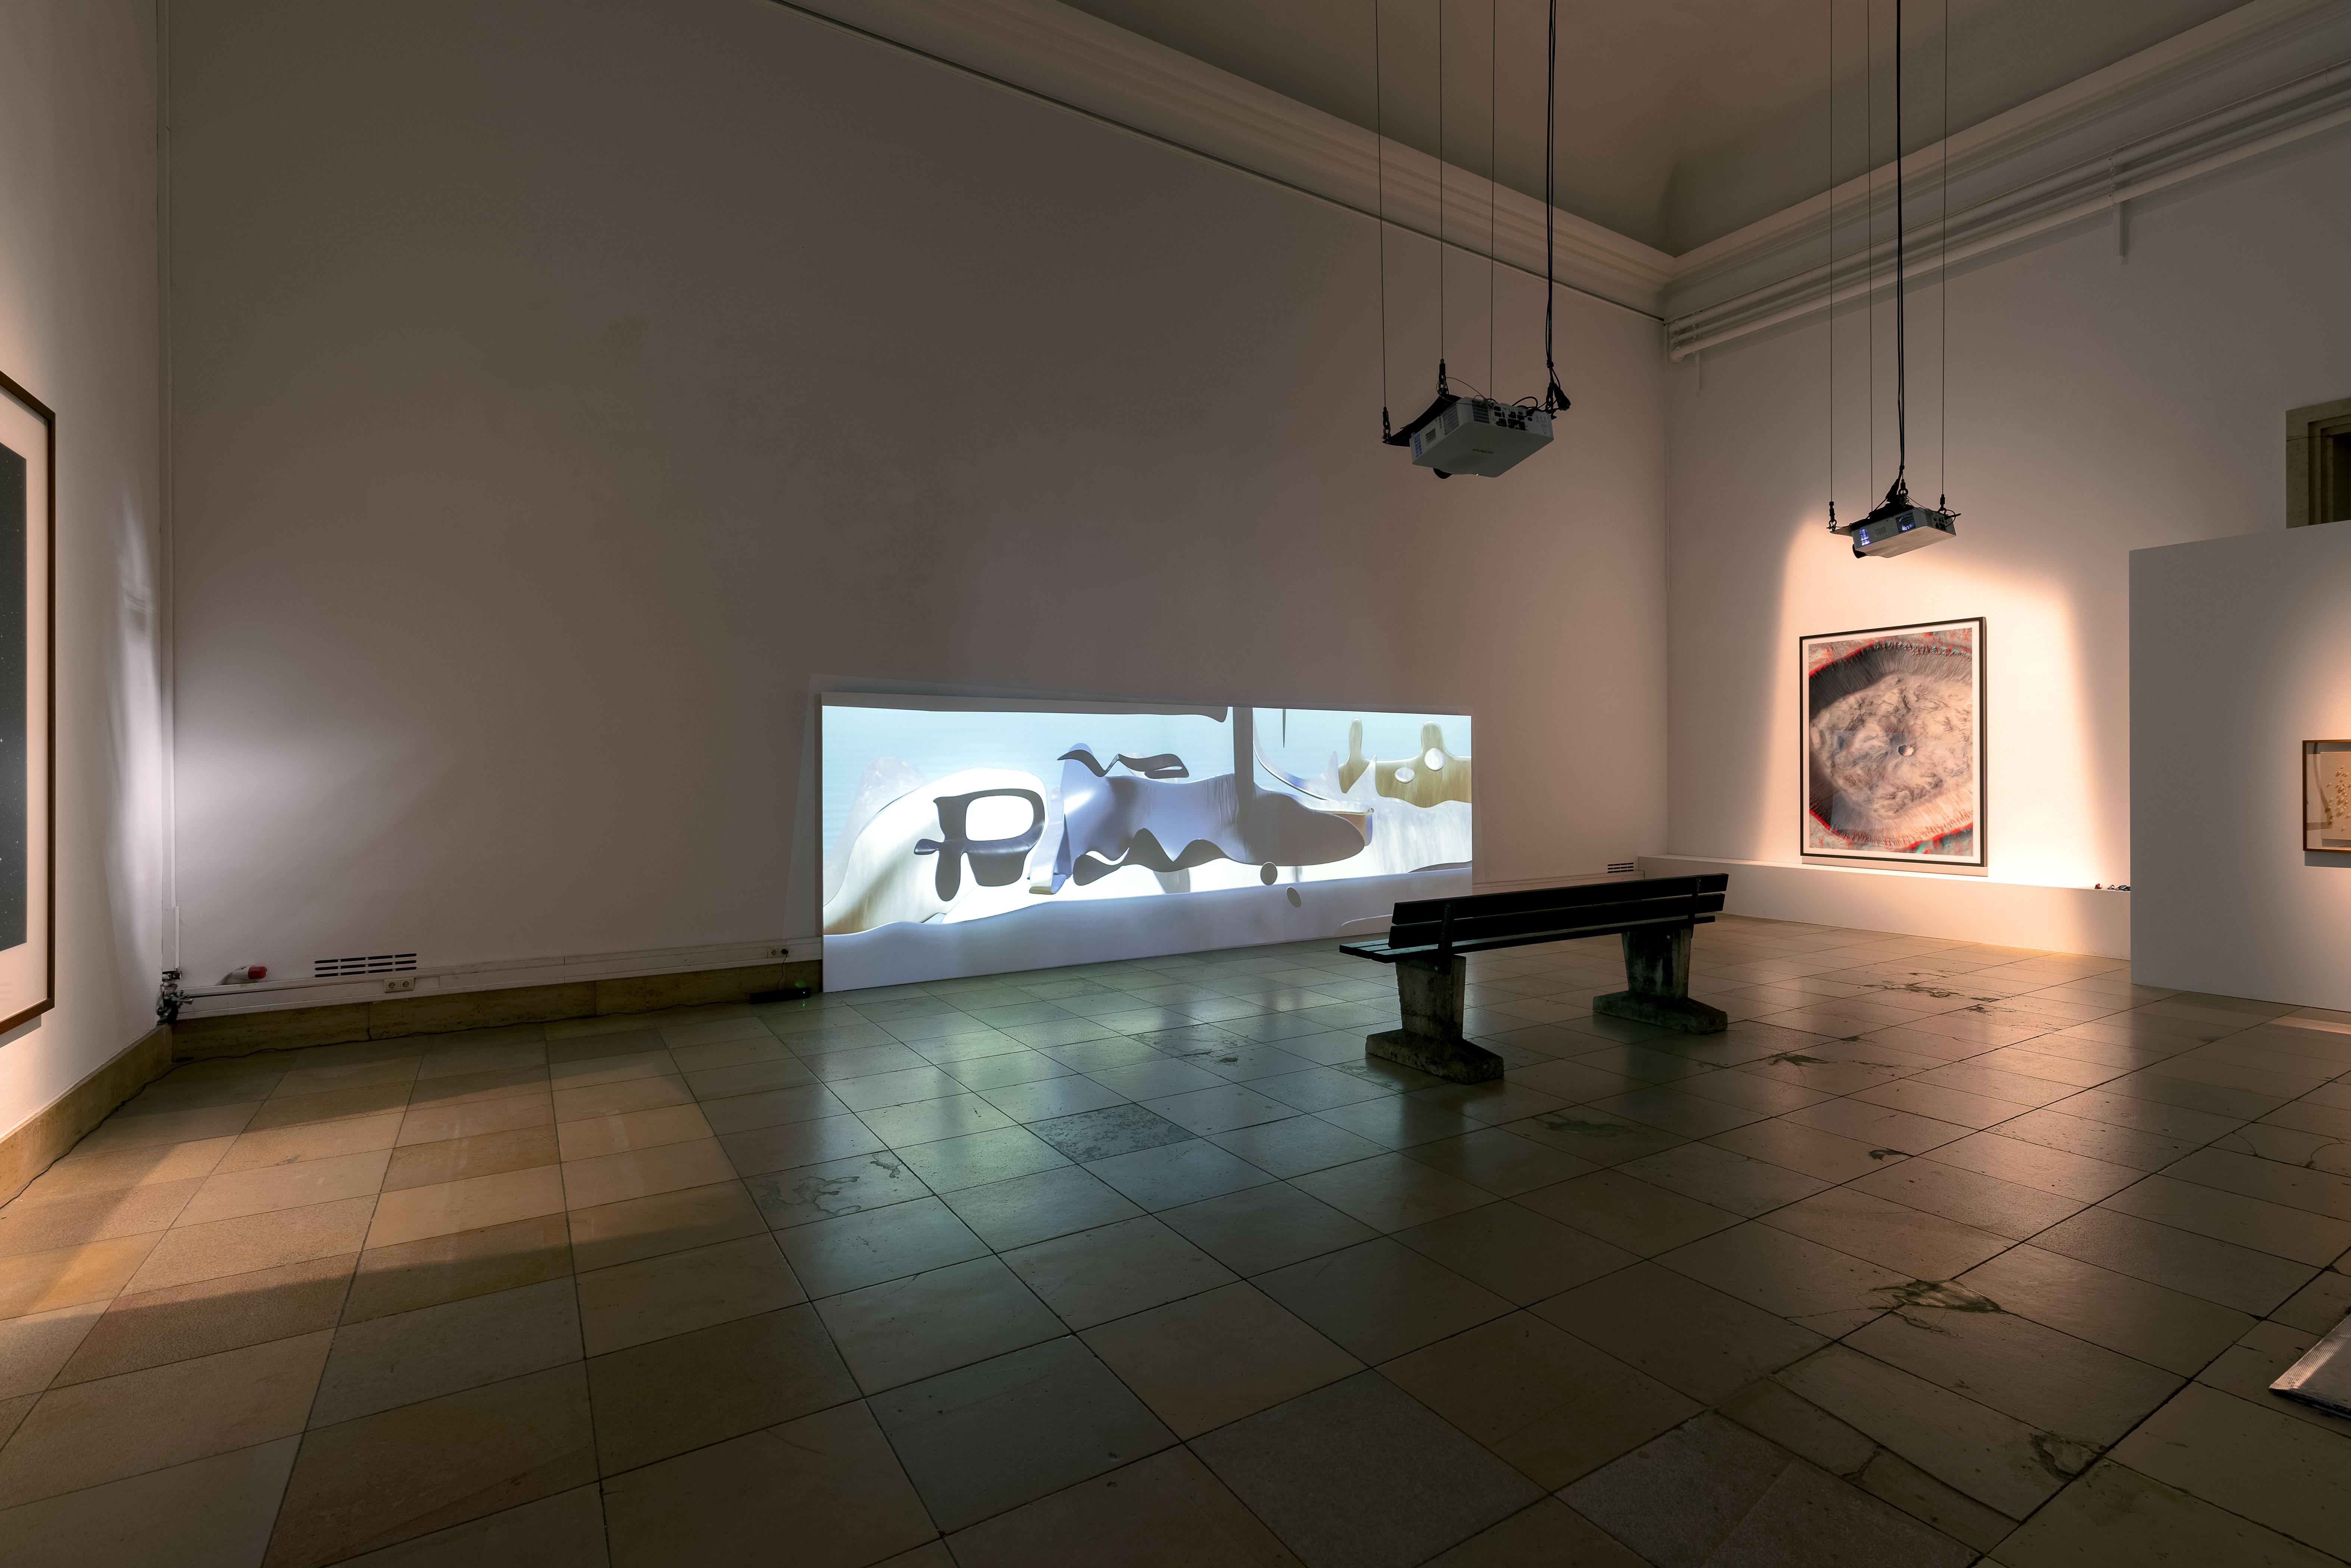 Beyond The See Paul Valentin Reglitterized Haus der Kunst